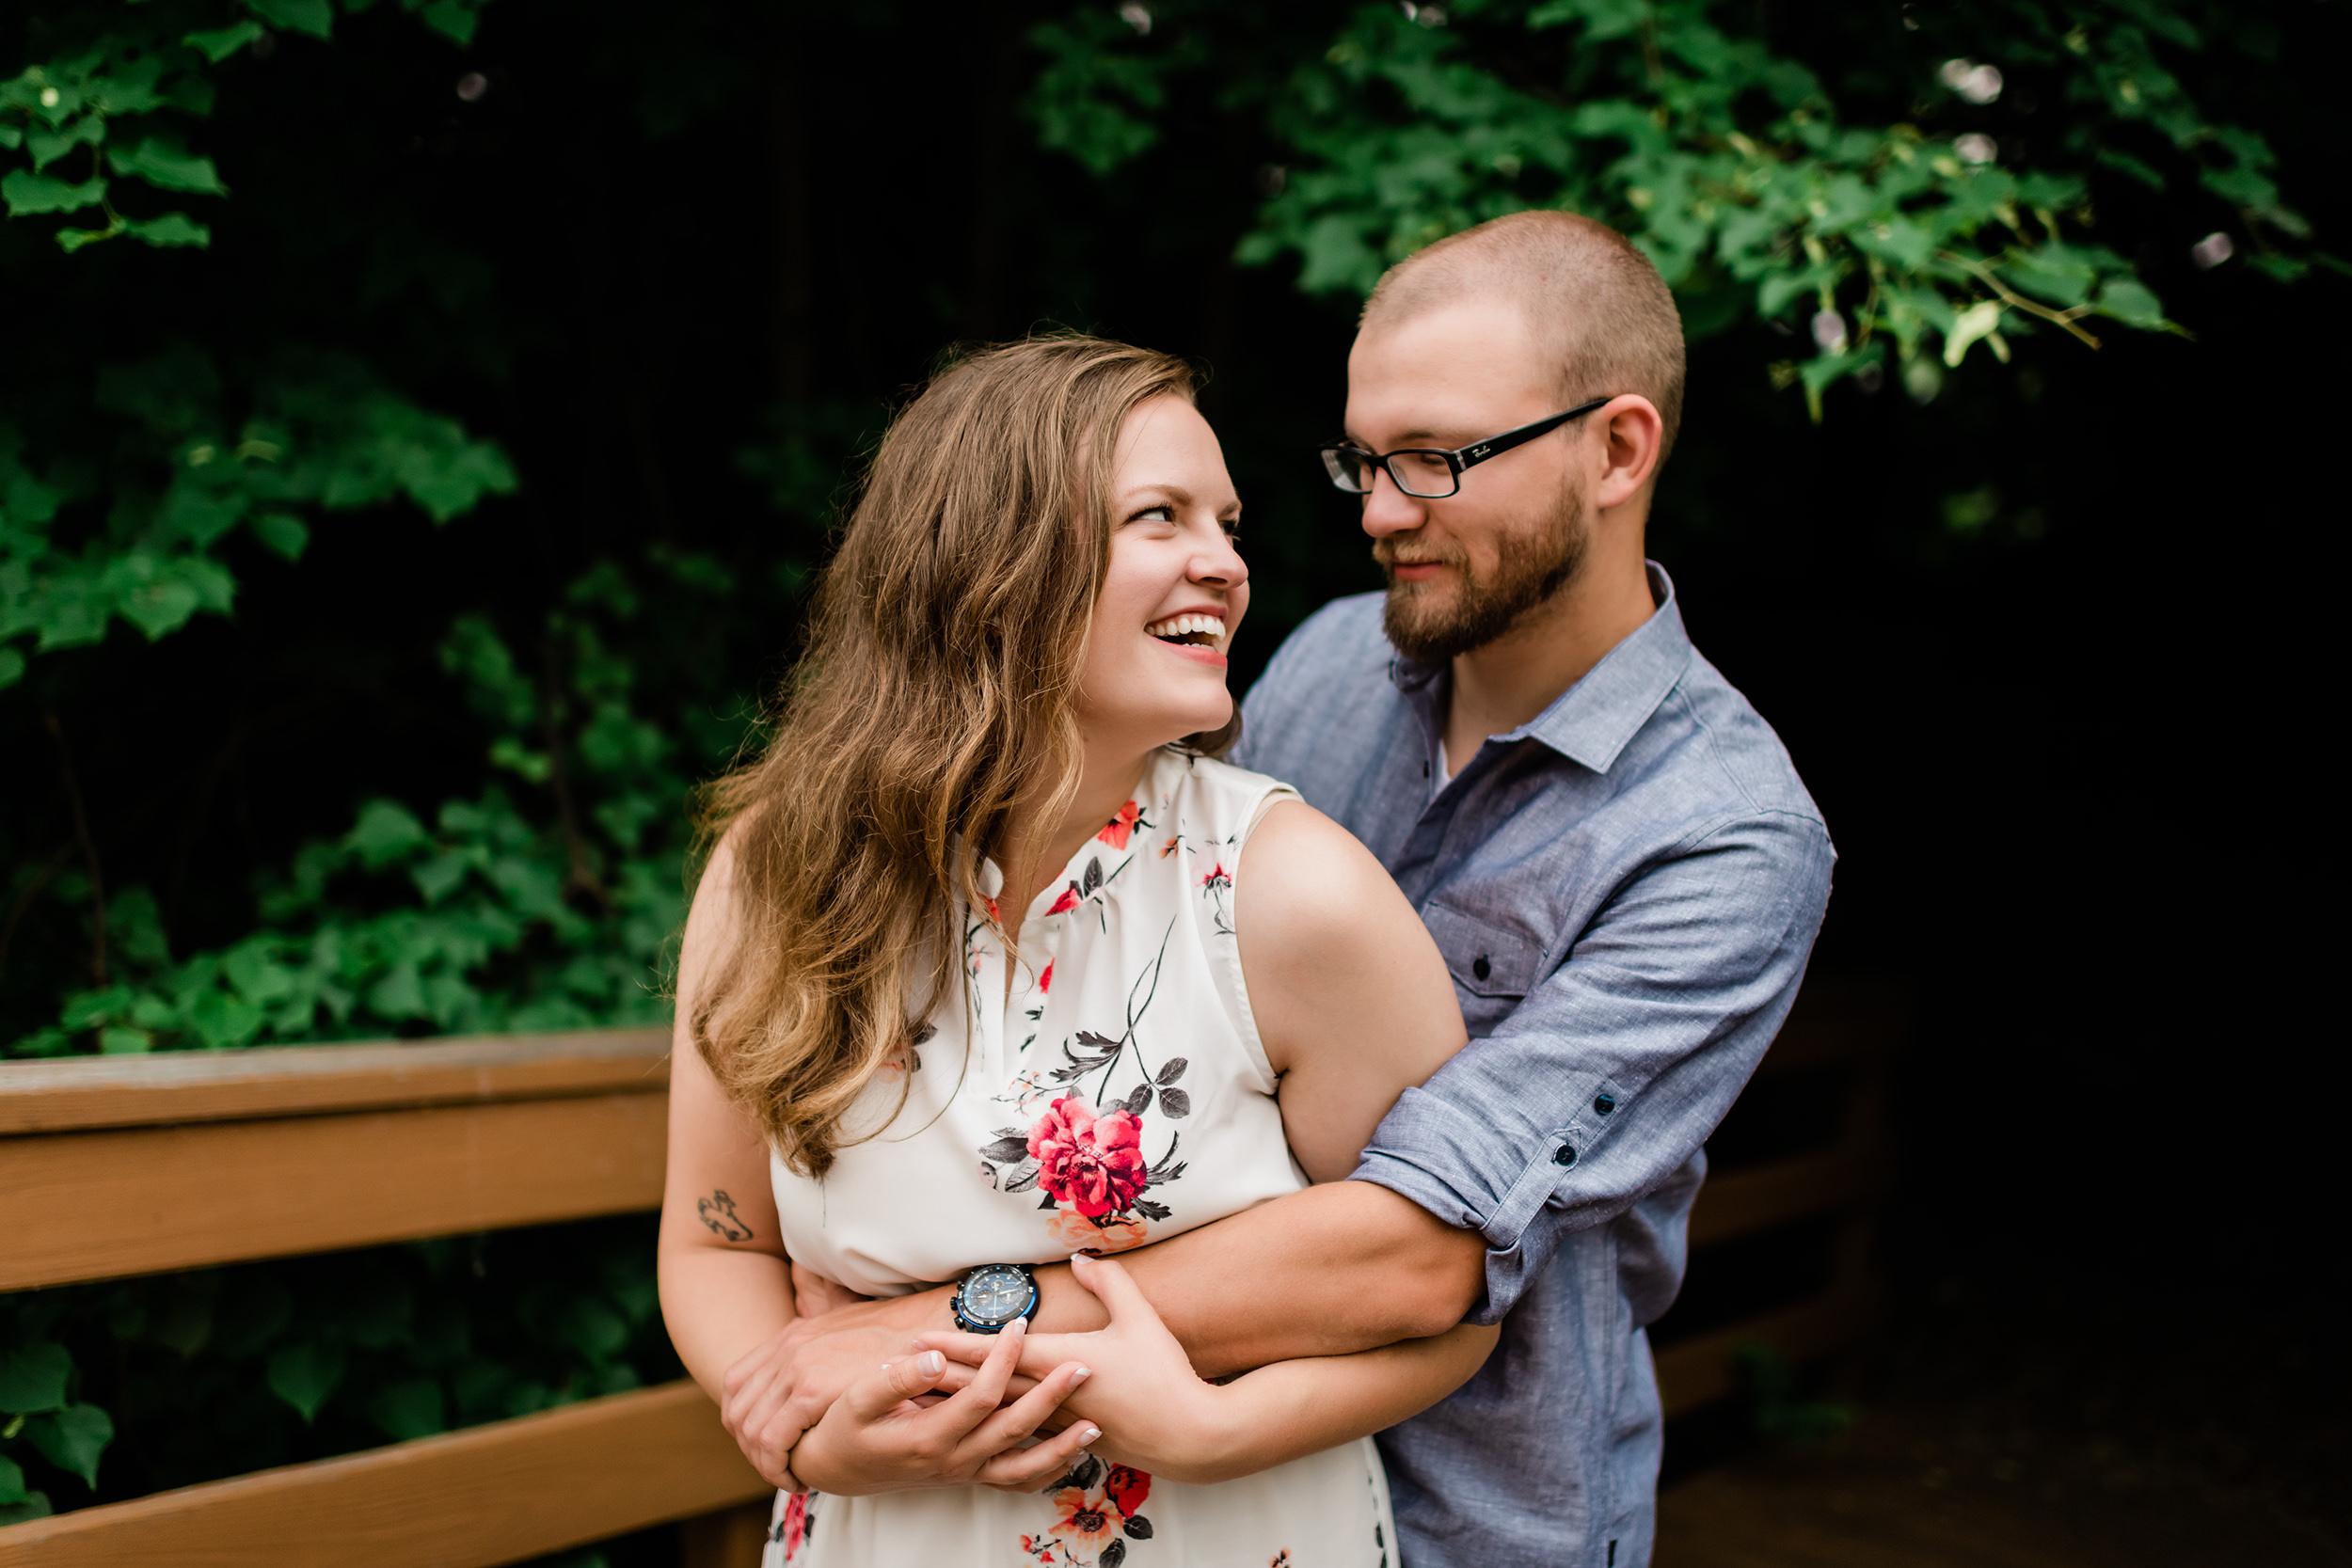 Man wraps his arms around his fiancé